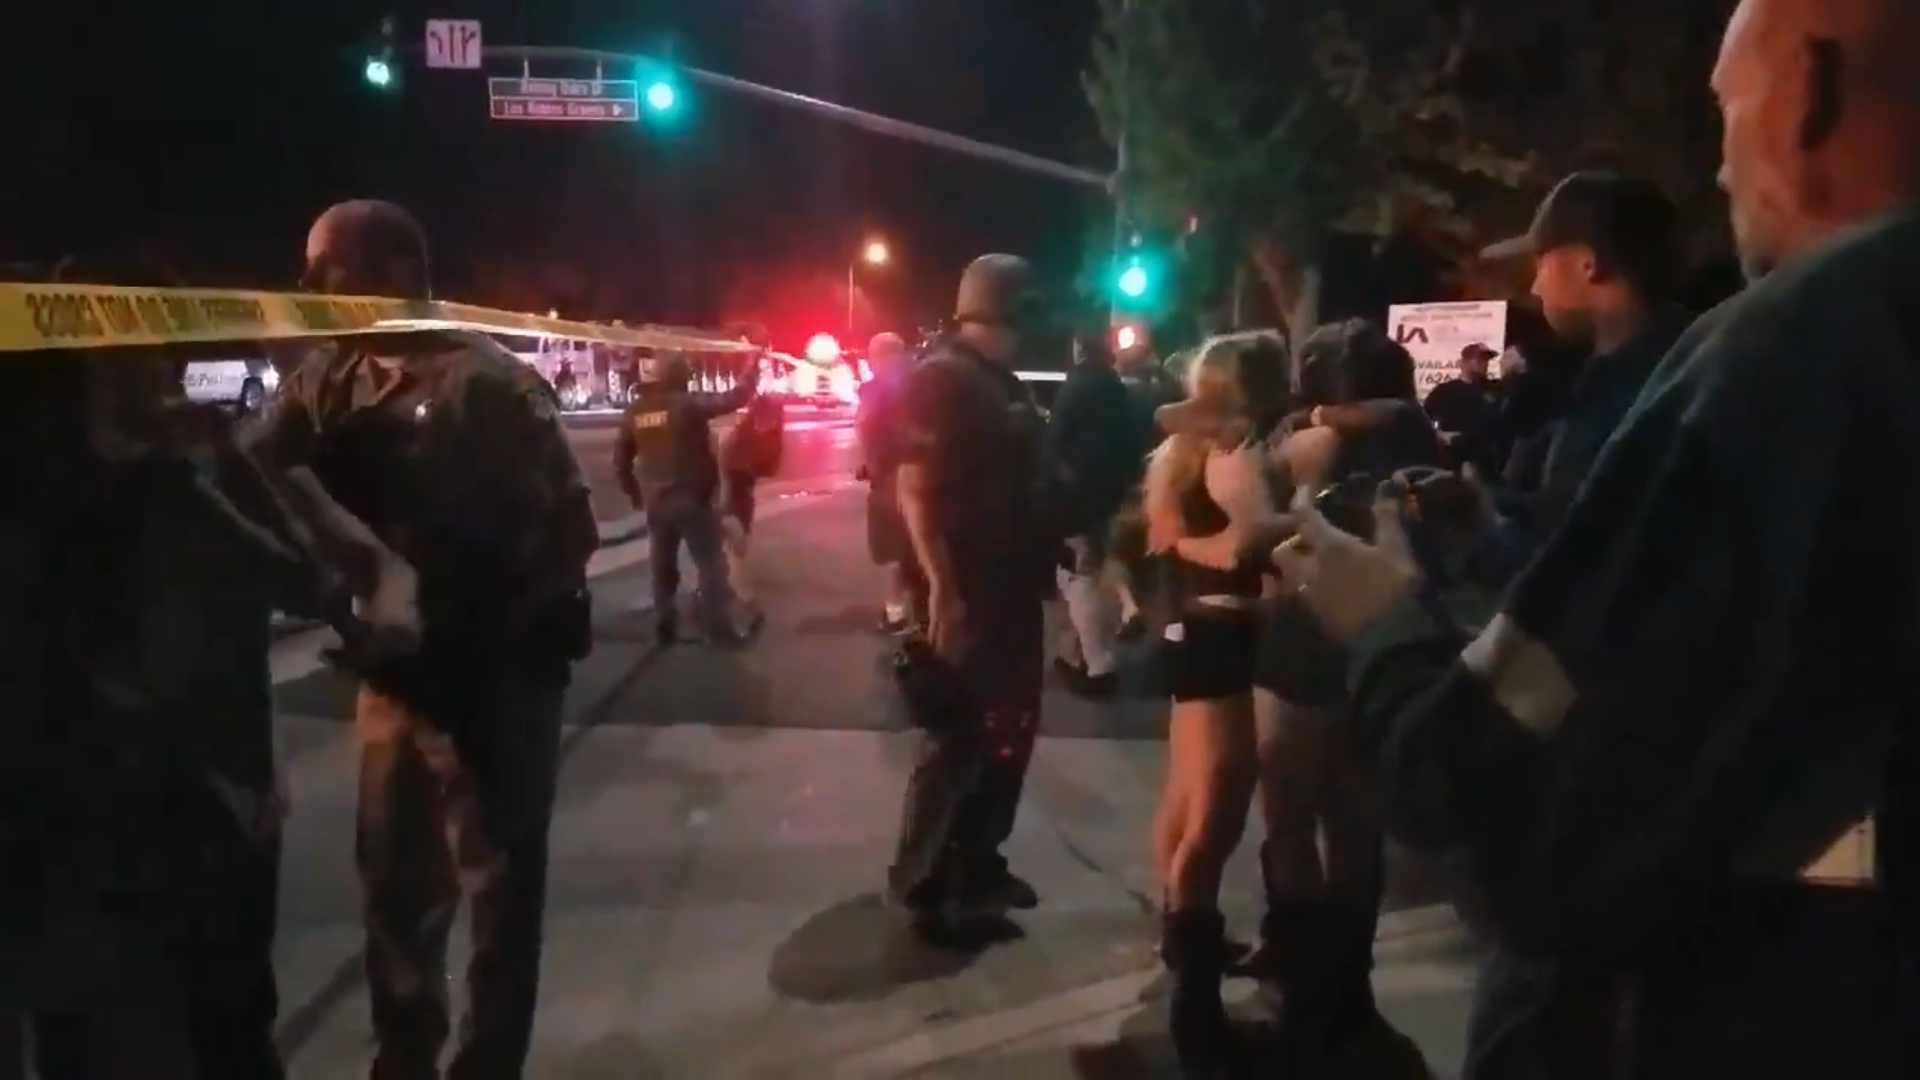 Scene outside Borderline Bar & Grill after mass shooting on November 7, 2018, Thousand Oaks, California